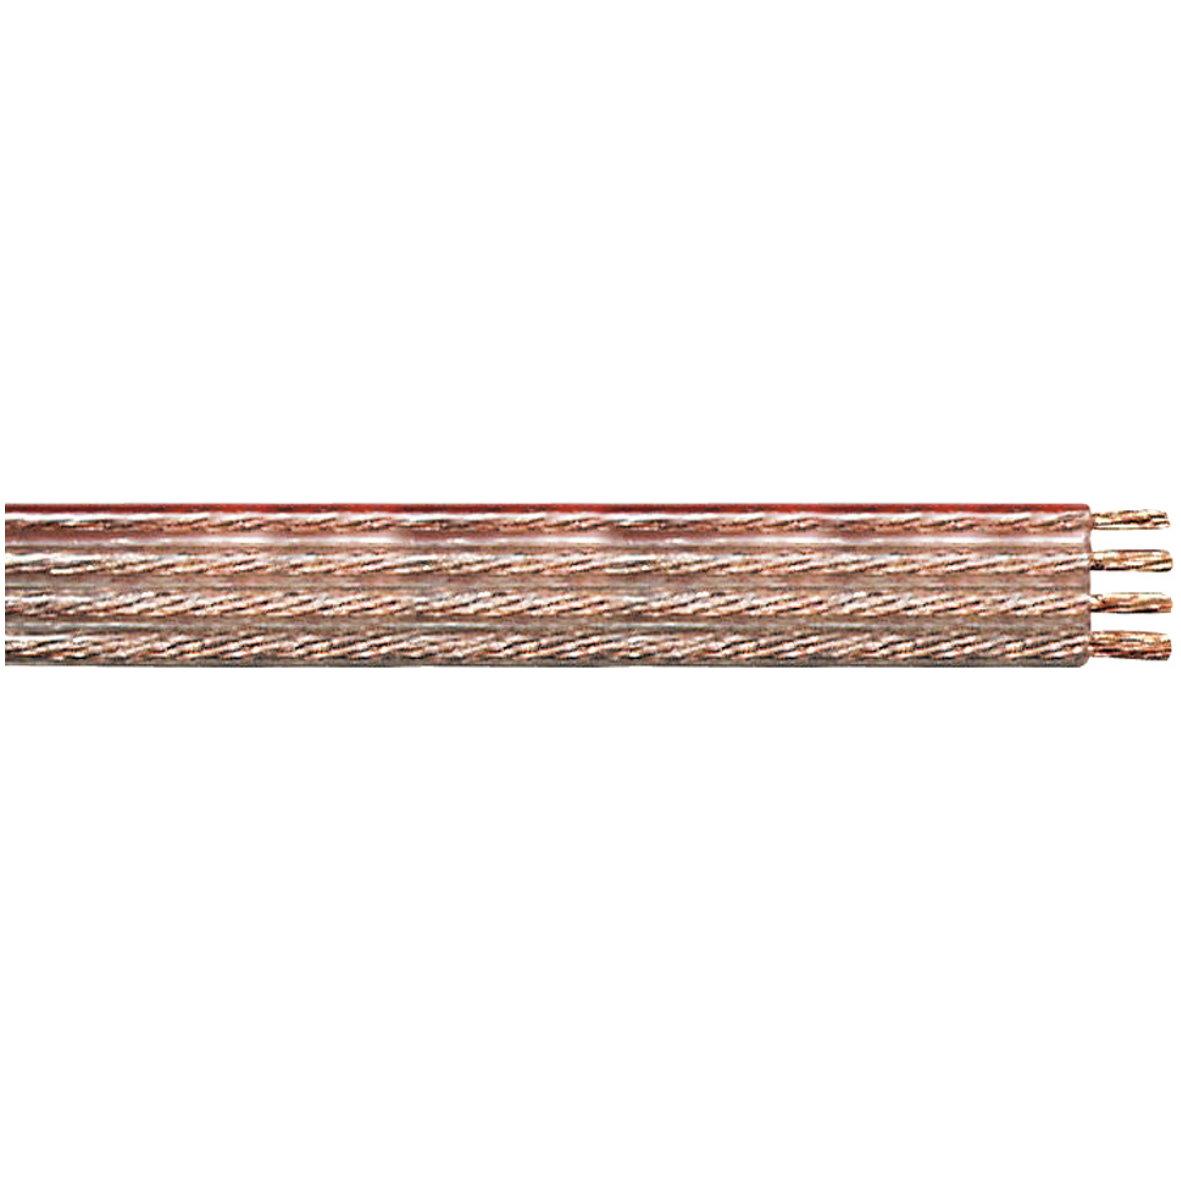 Lautsprecherkabel Lautsprecher Kabel Boxenkabel OFC CCA Kupfer 5-1000m 100m HIFI